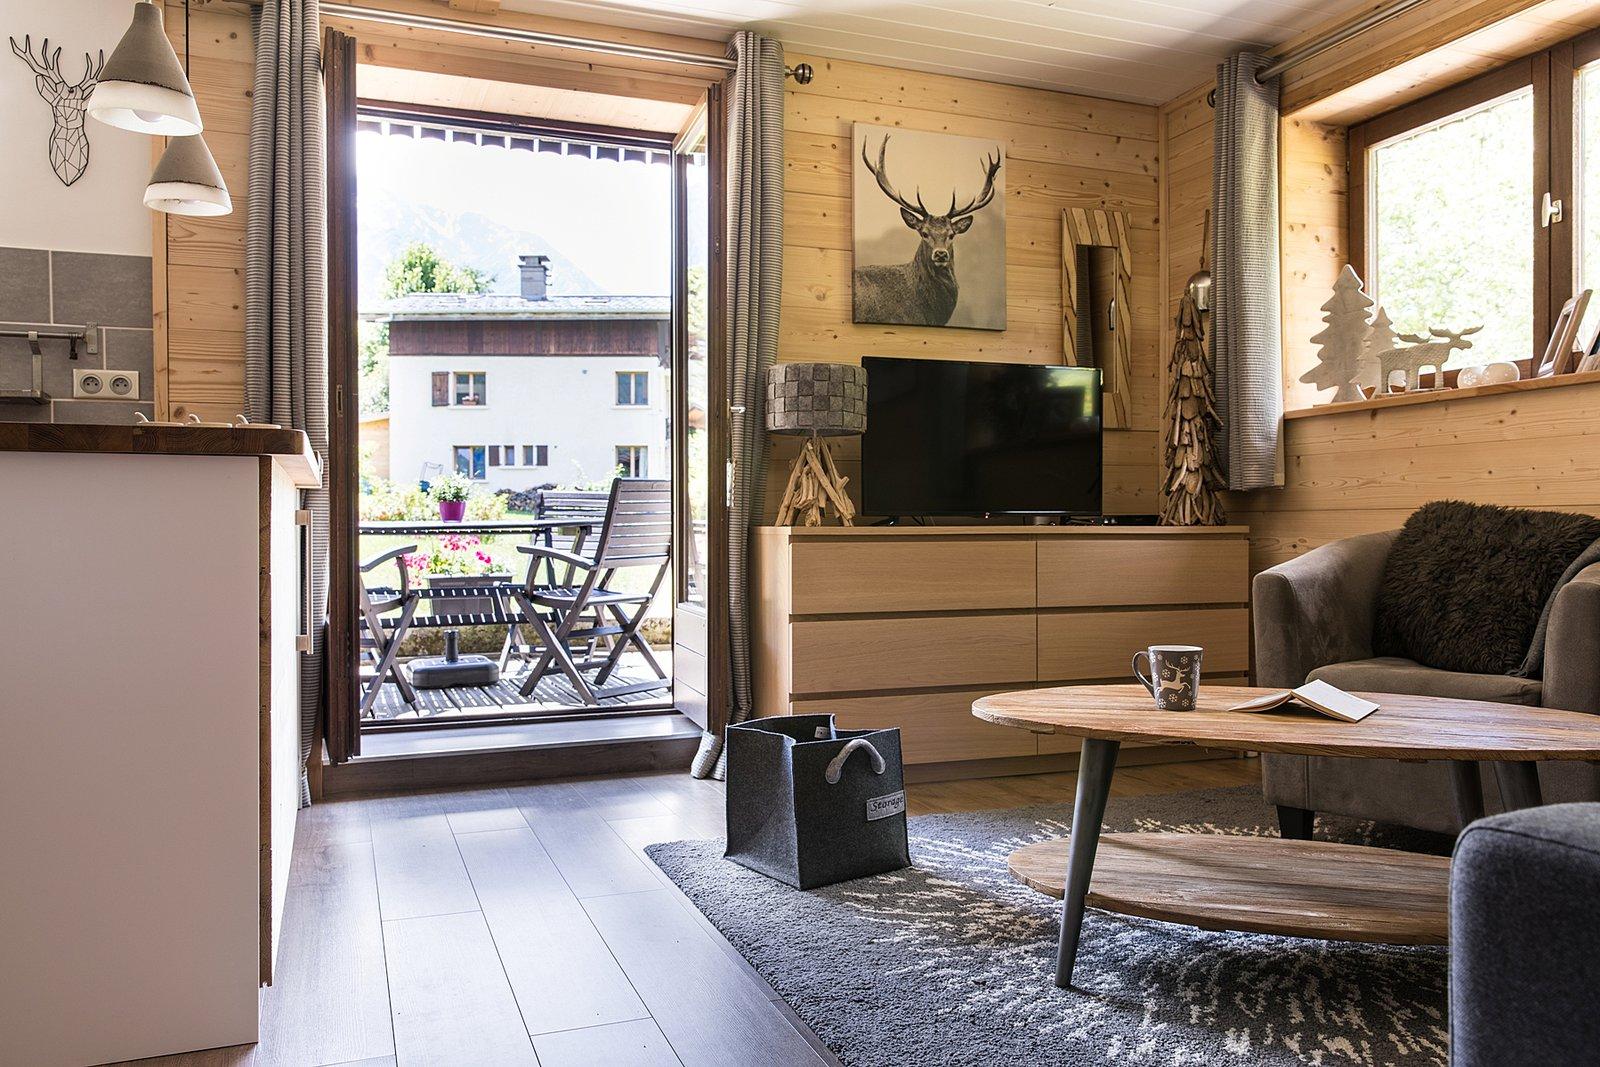 Cry Apartment, Chamonix: Self-catering accommodation